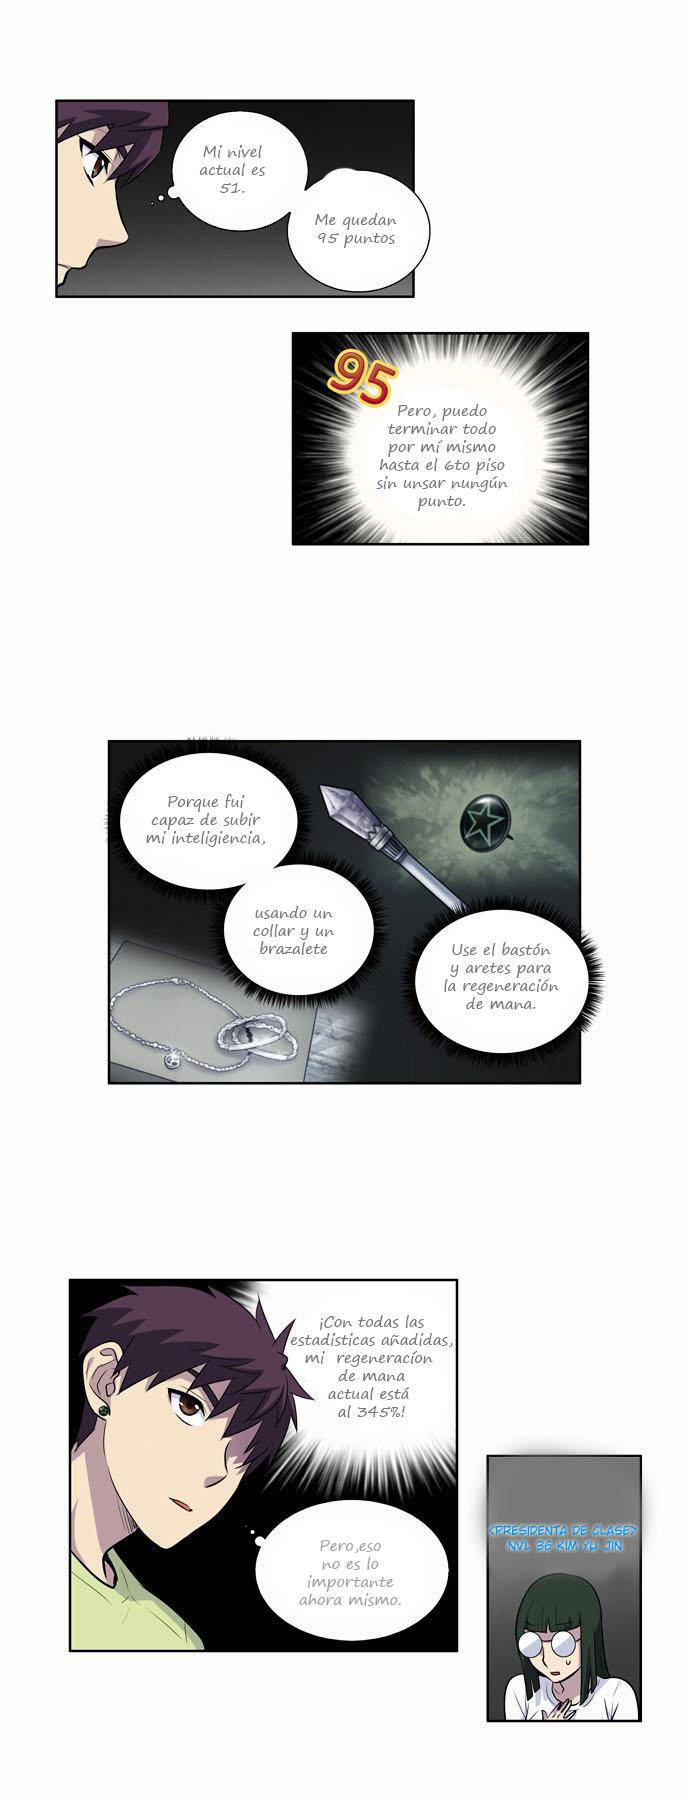 http://c5.ninemanga.com/es_manga/61/1725/434275/0d8ec7cf69240c1055b2a6e91fb91b3b.jpg Page 15